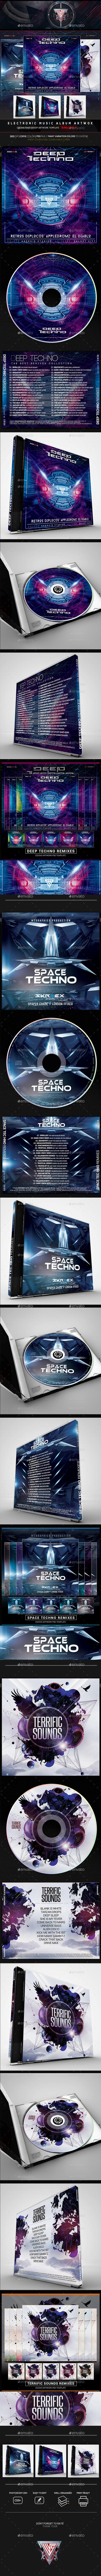 Electro Music CD/DVD Template Bundle Vol. 7 - CD & DVD Artwork Print Templates